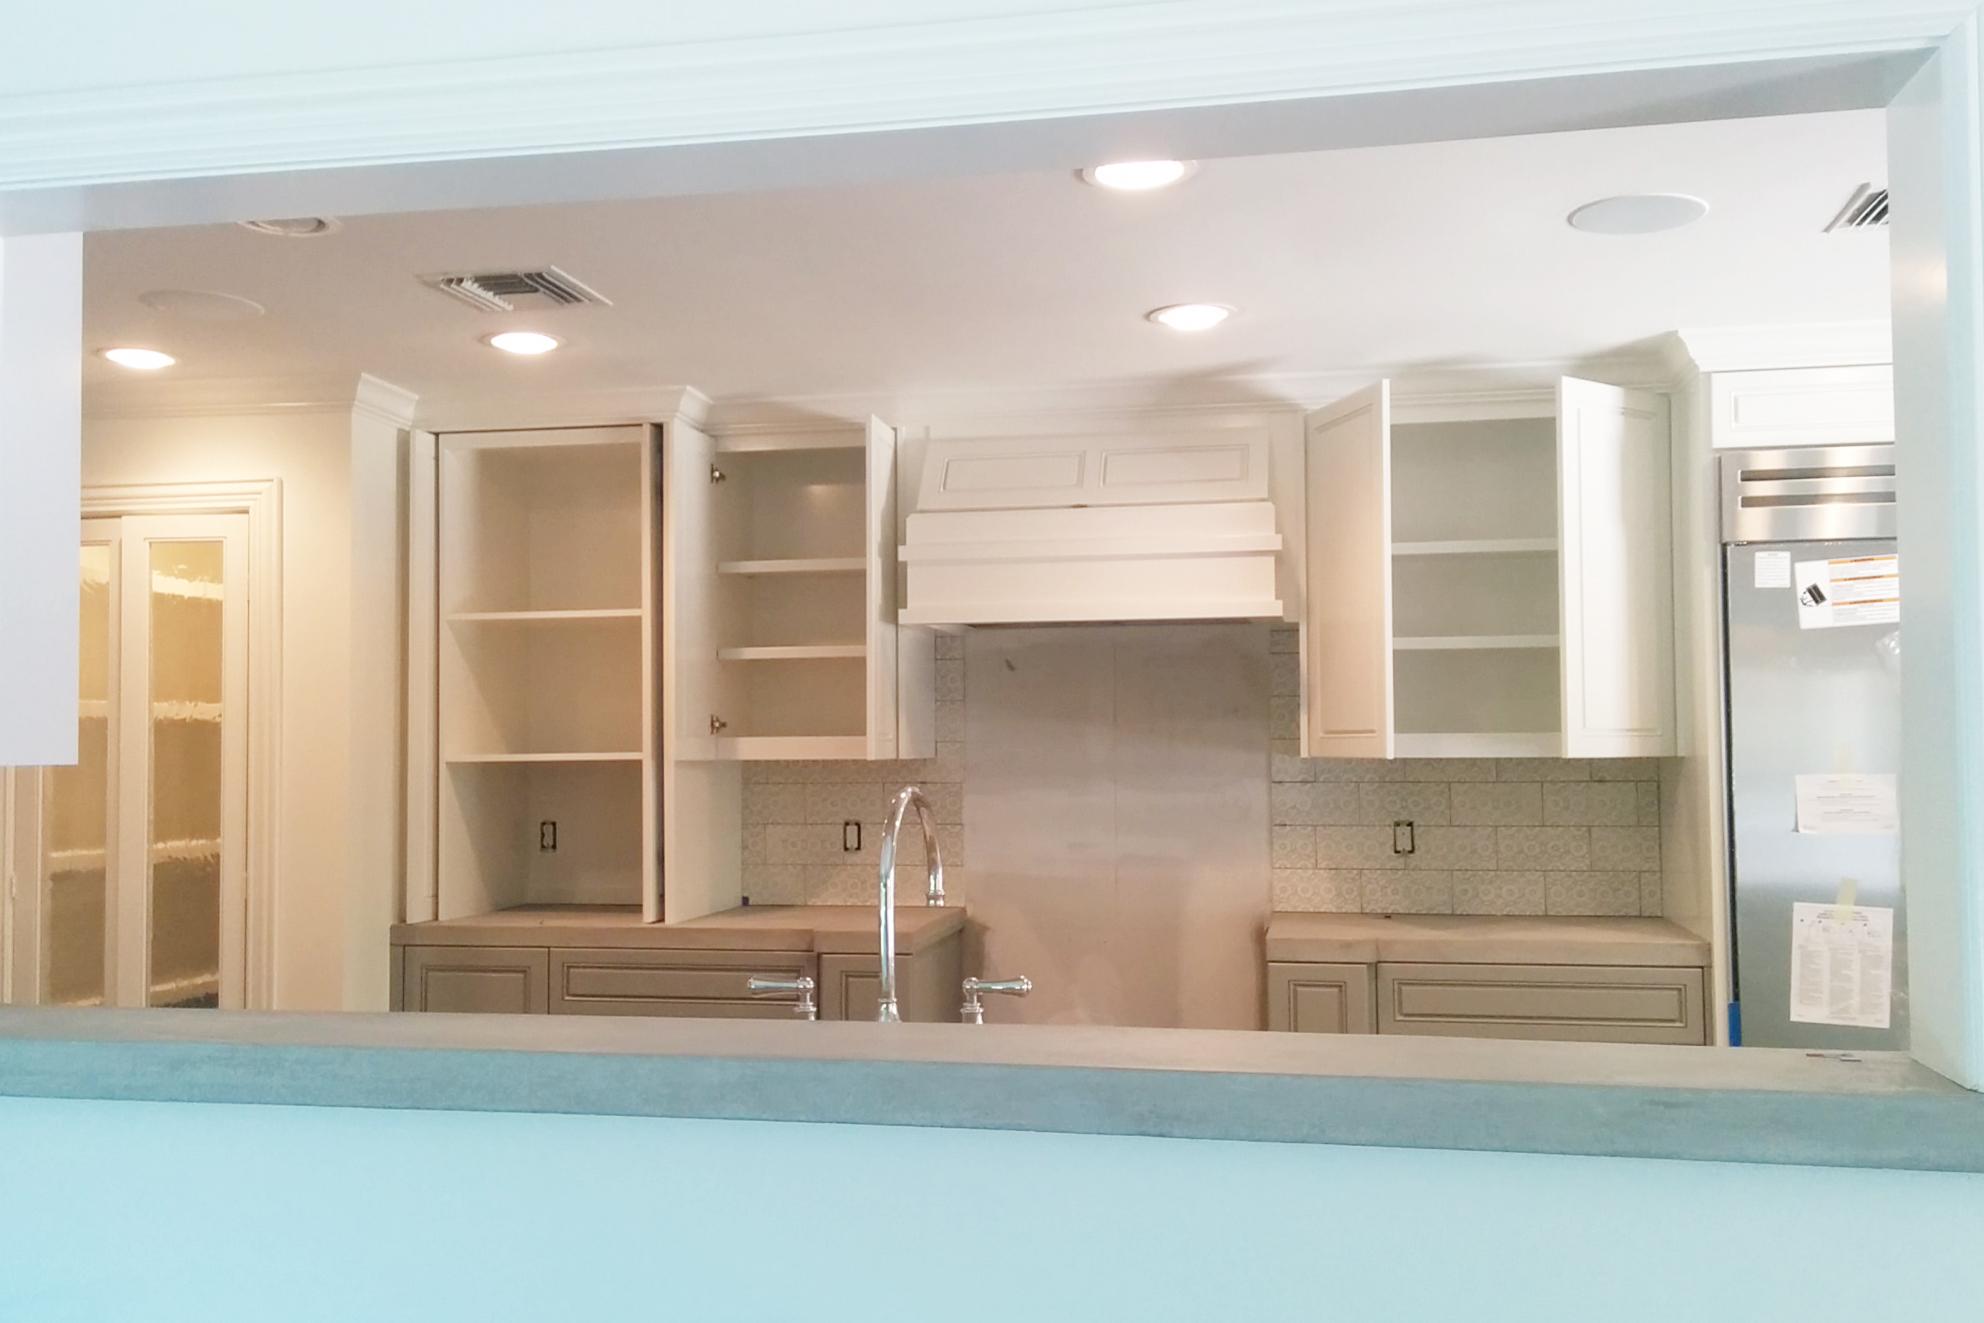 Houston kitchen remodel in progress by Jamie House Design. Concrete counter ledge.